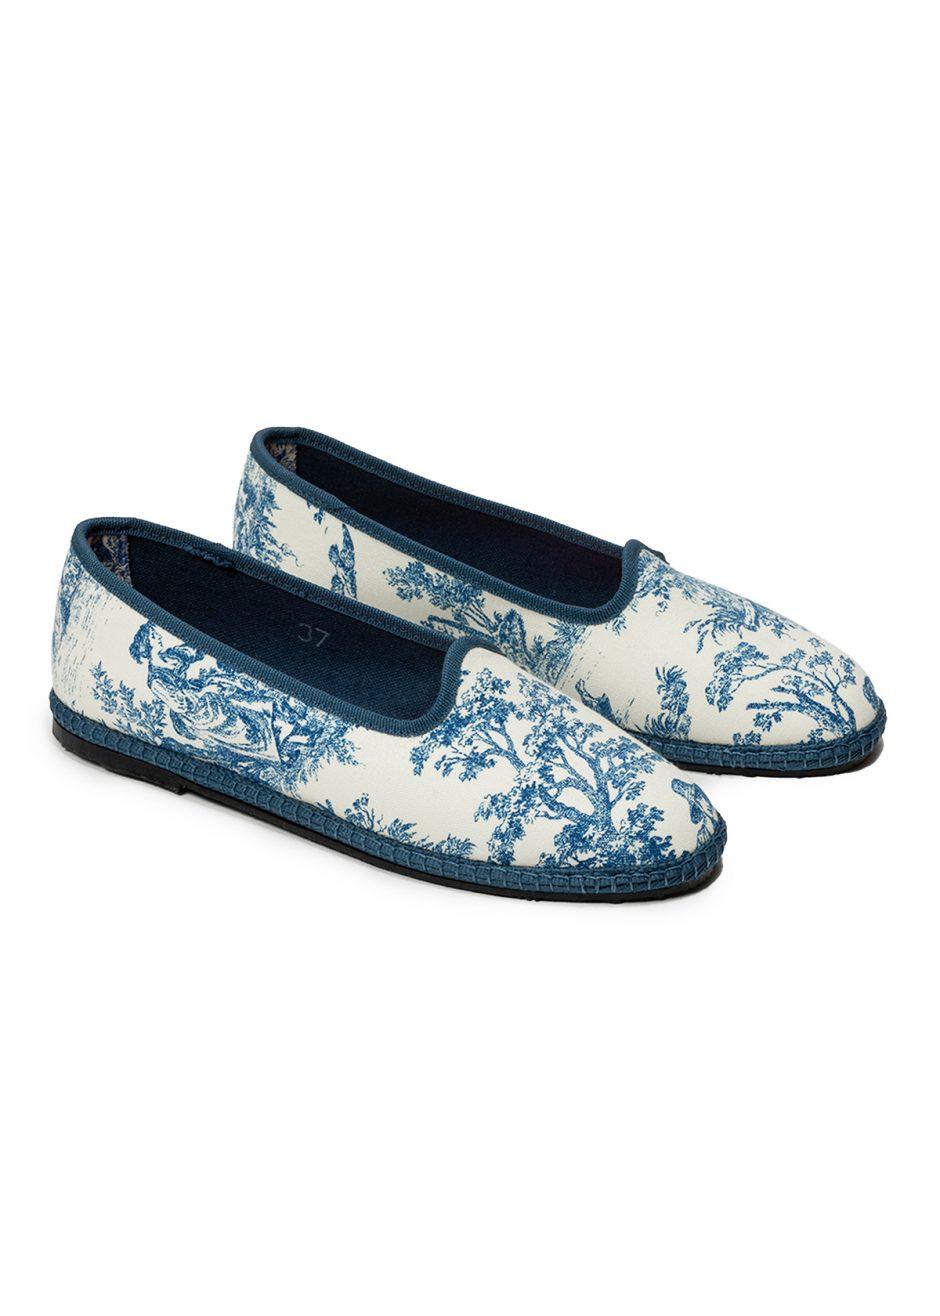 Peggy – Furlana avio blue wildflower fantasy cotton